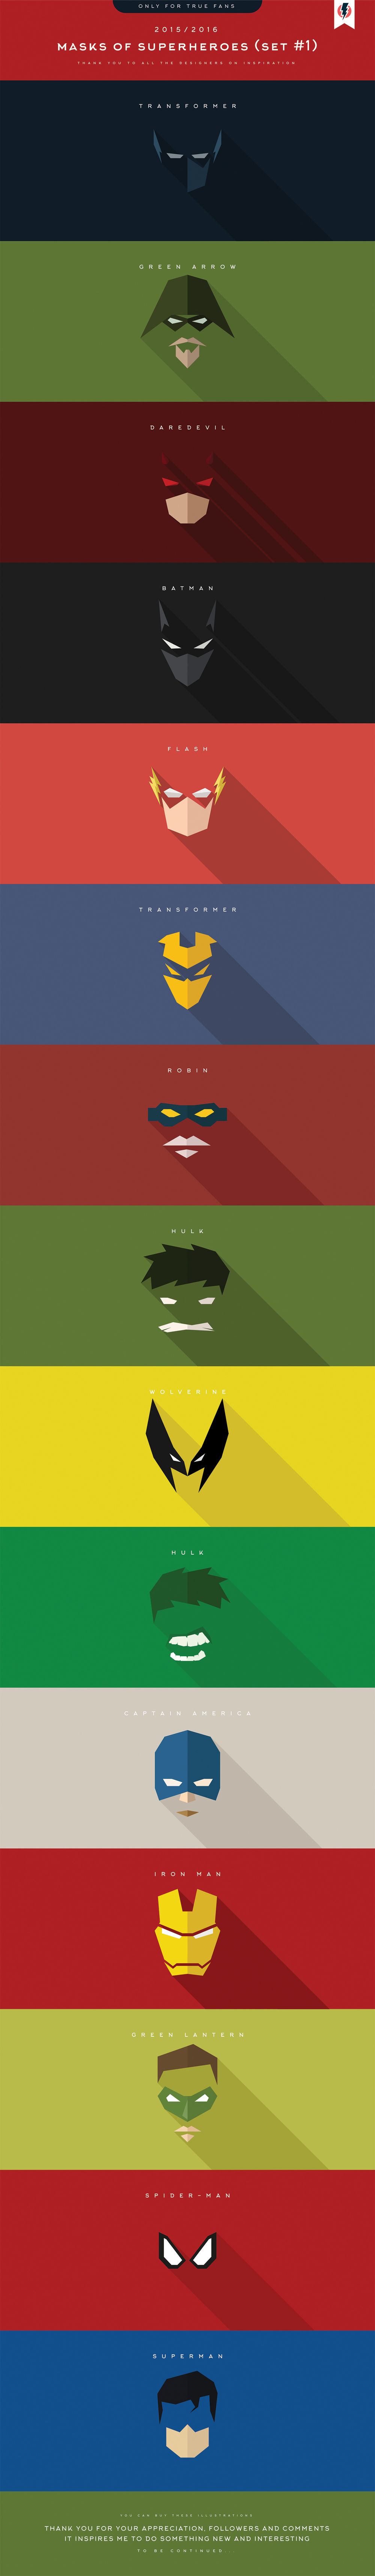 Superhero mask art 1.jpg